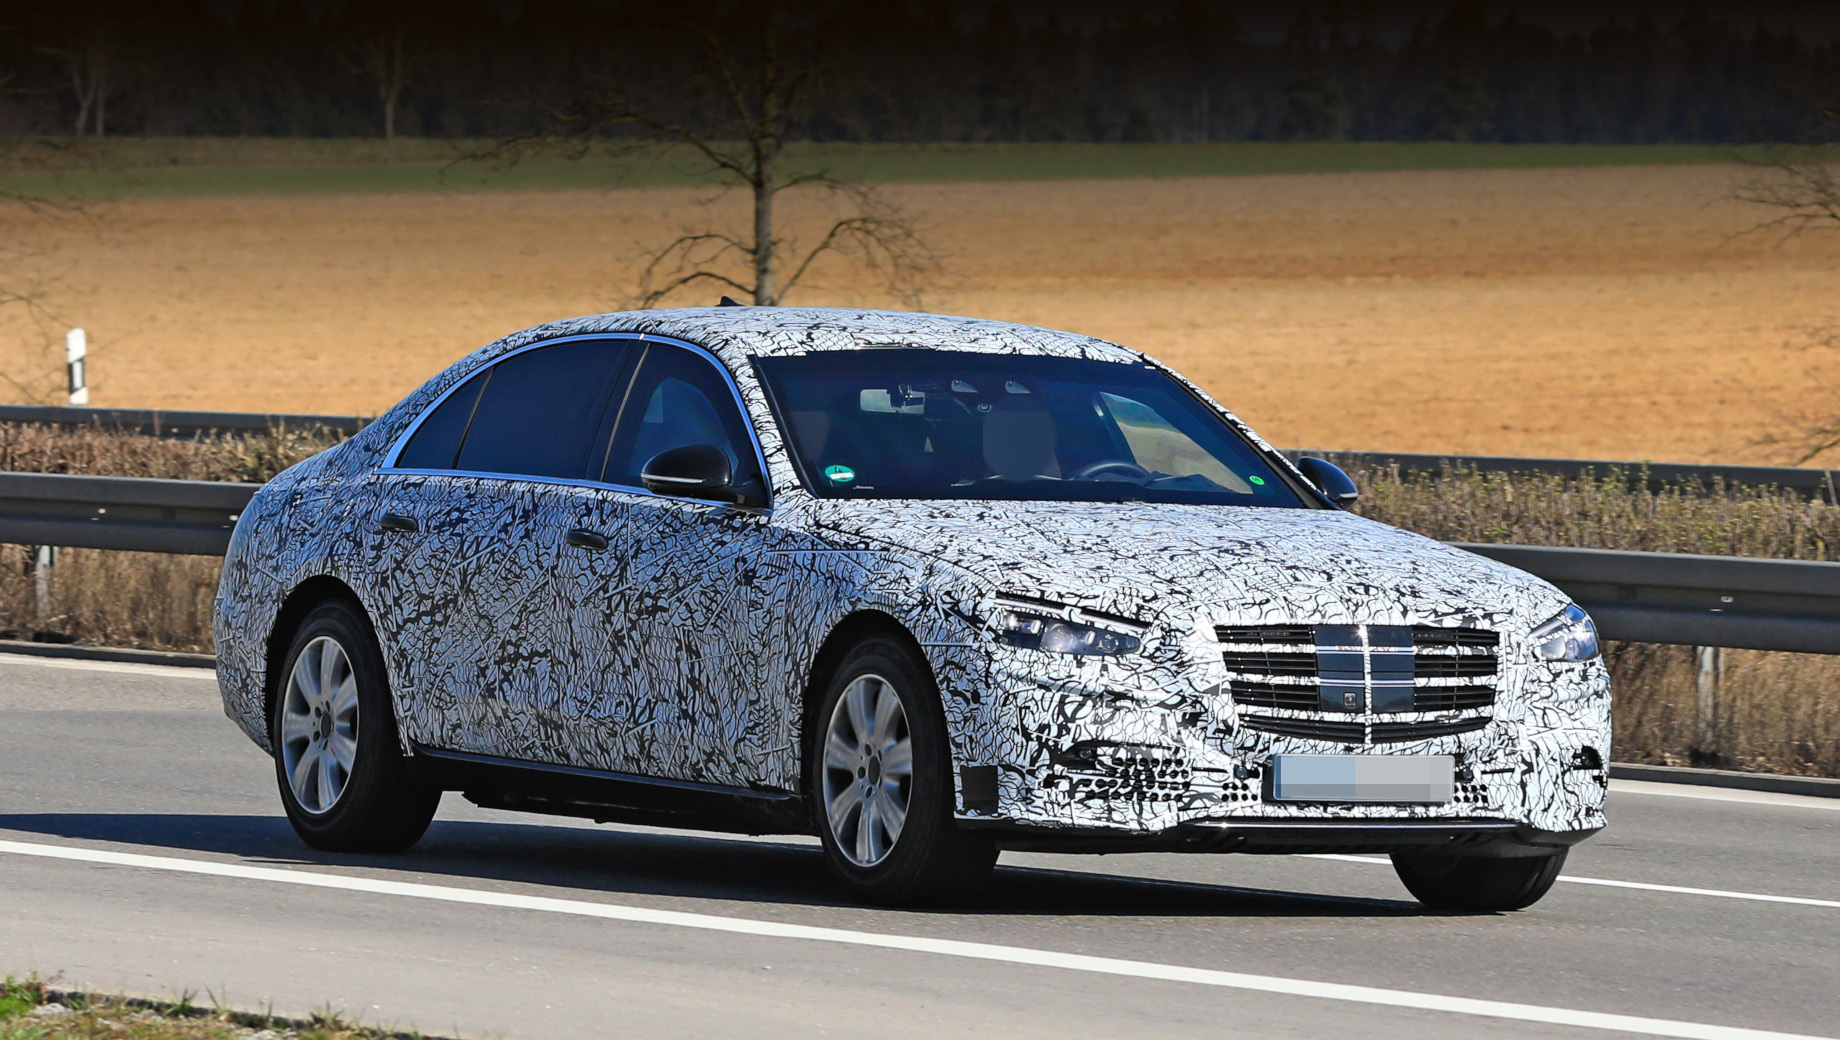 Новый Mercedes-Benz S-Class Guard впервые замечен на испытаниях